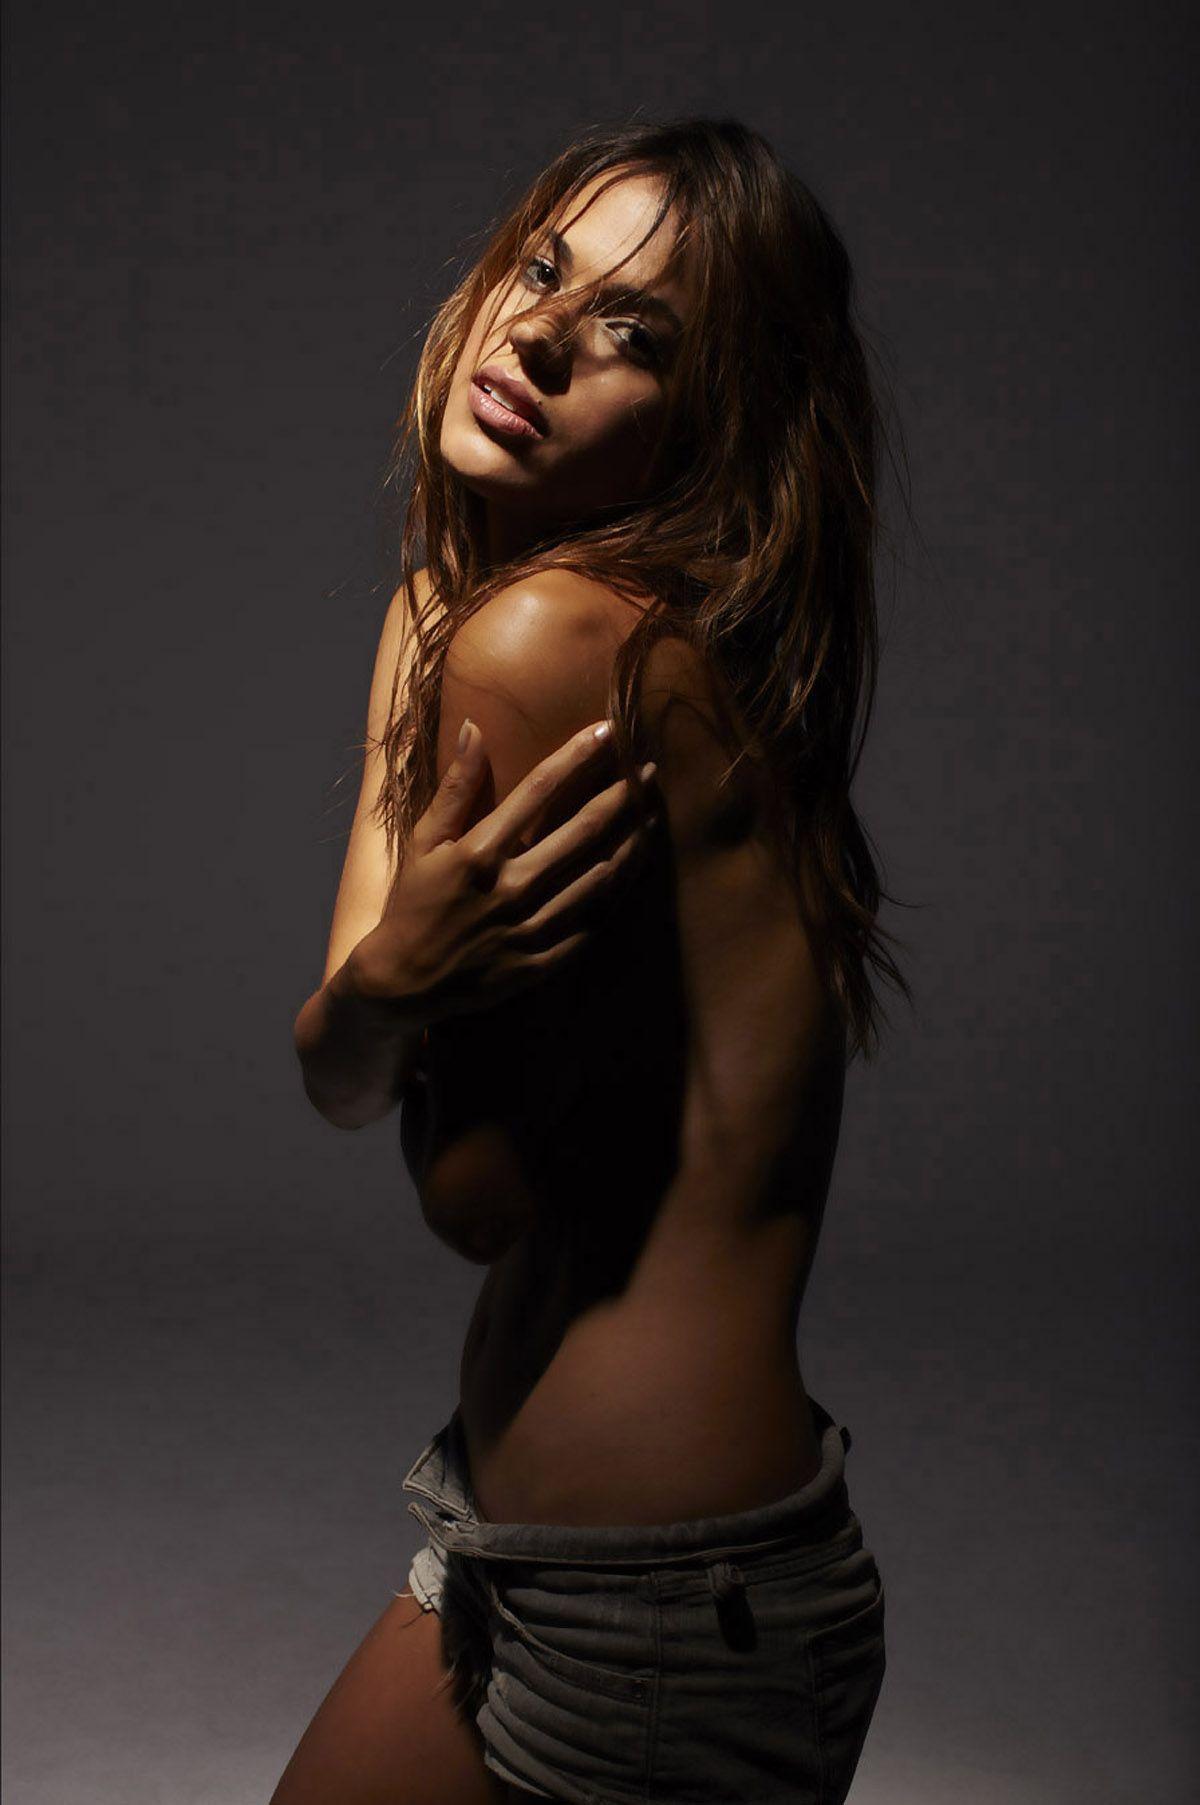 Rayla-Jacunda-Topless-1